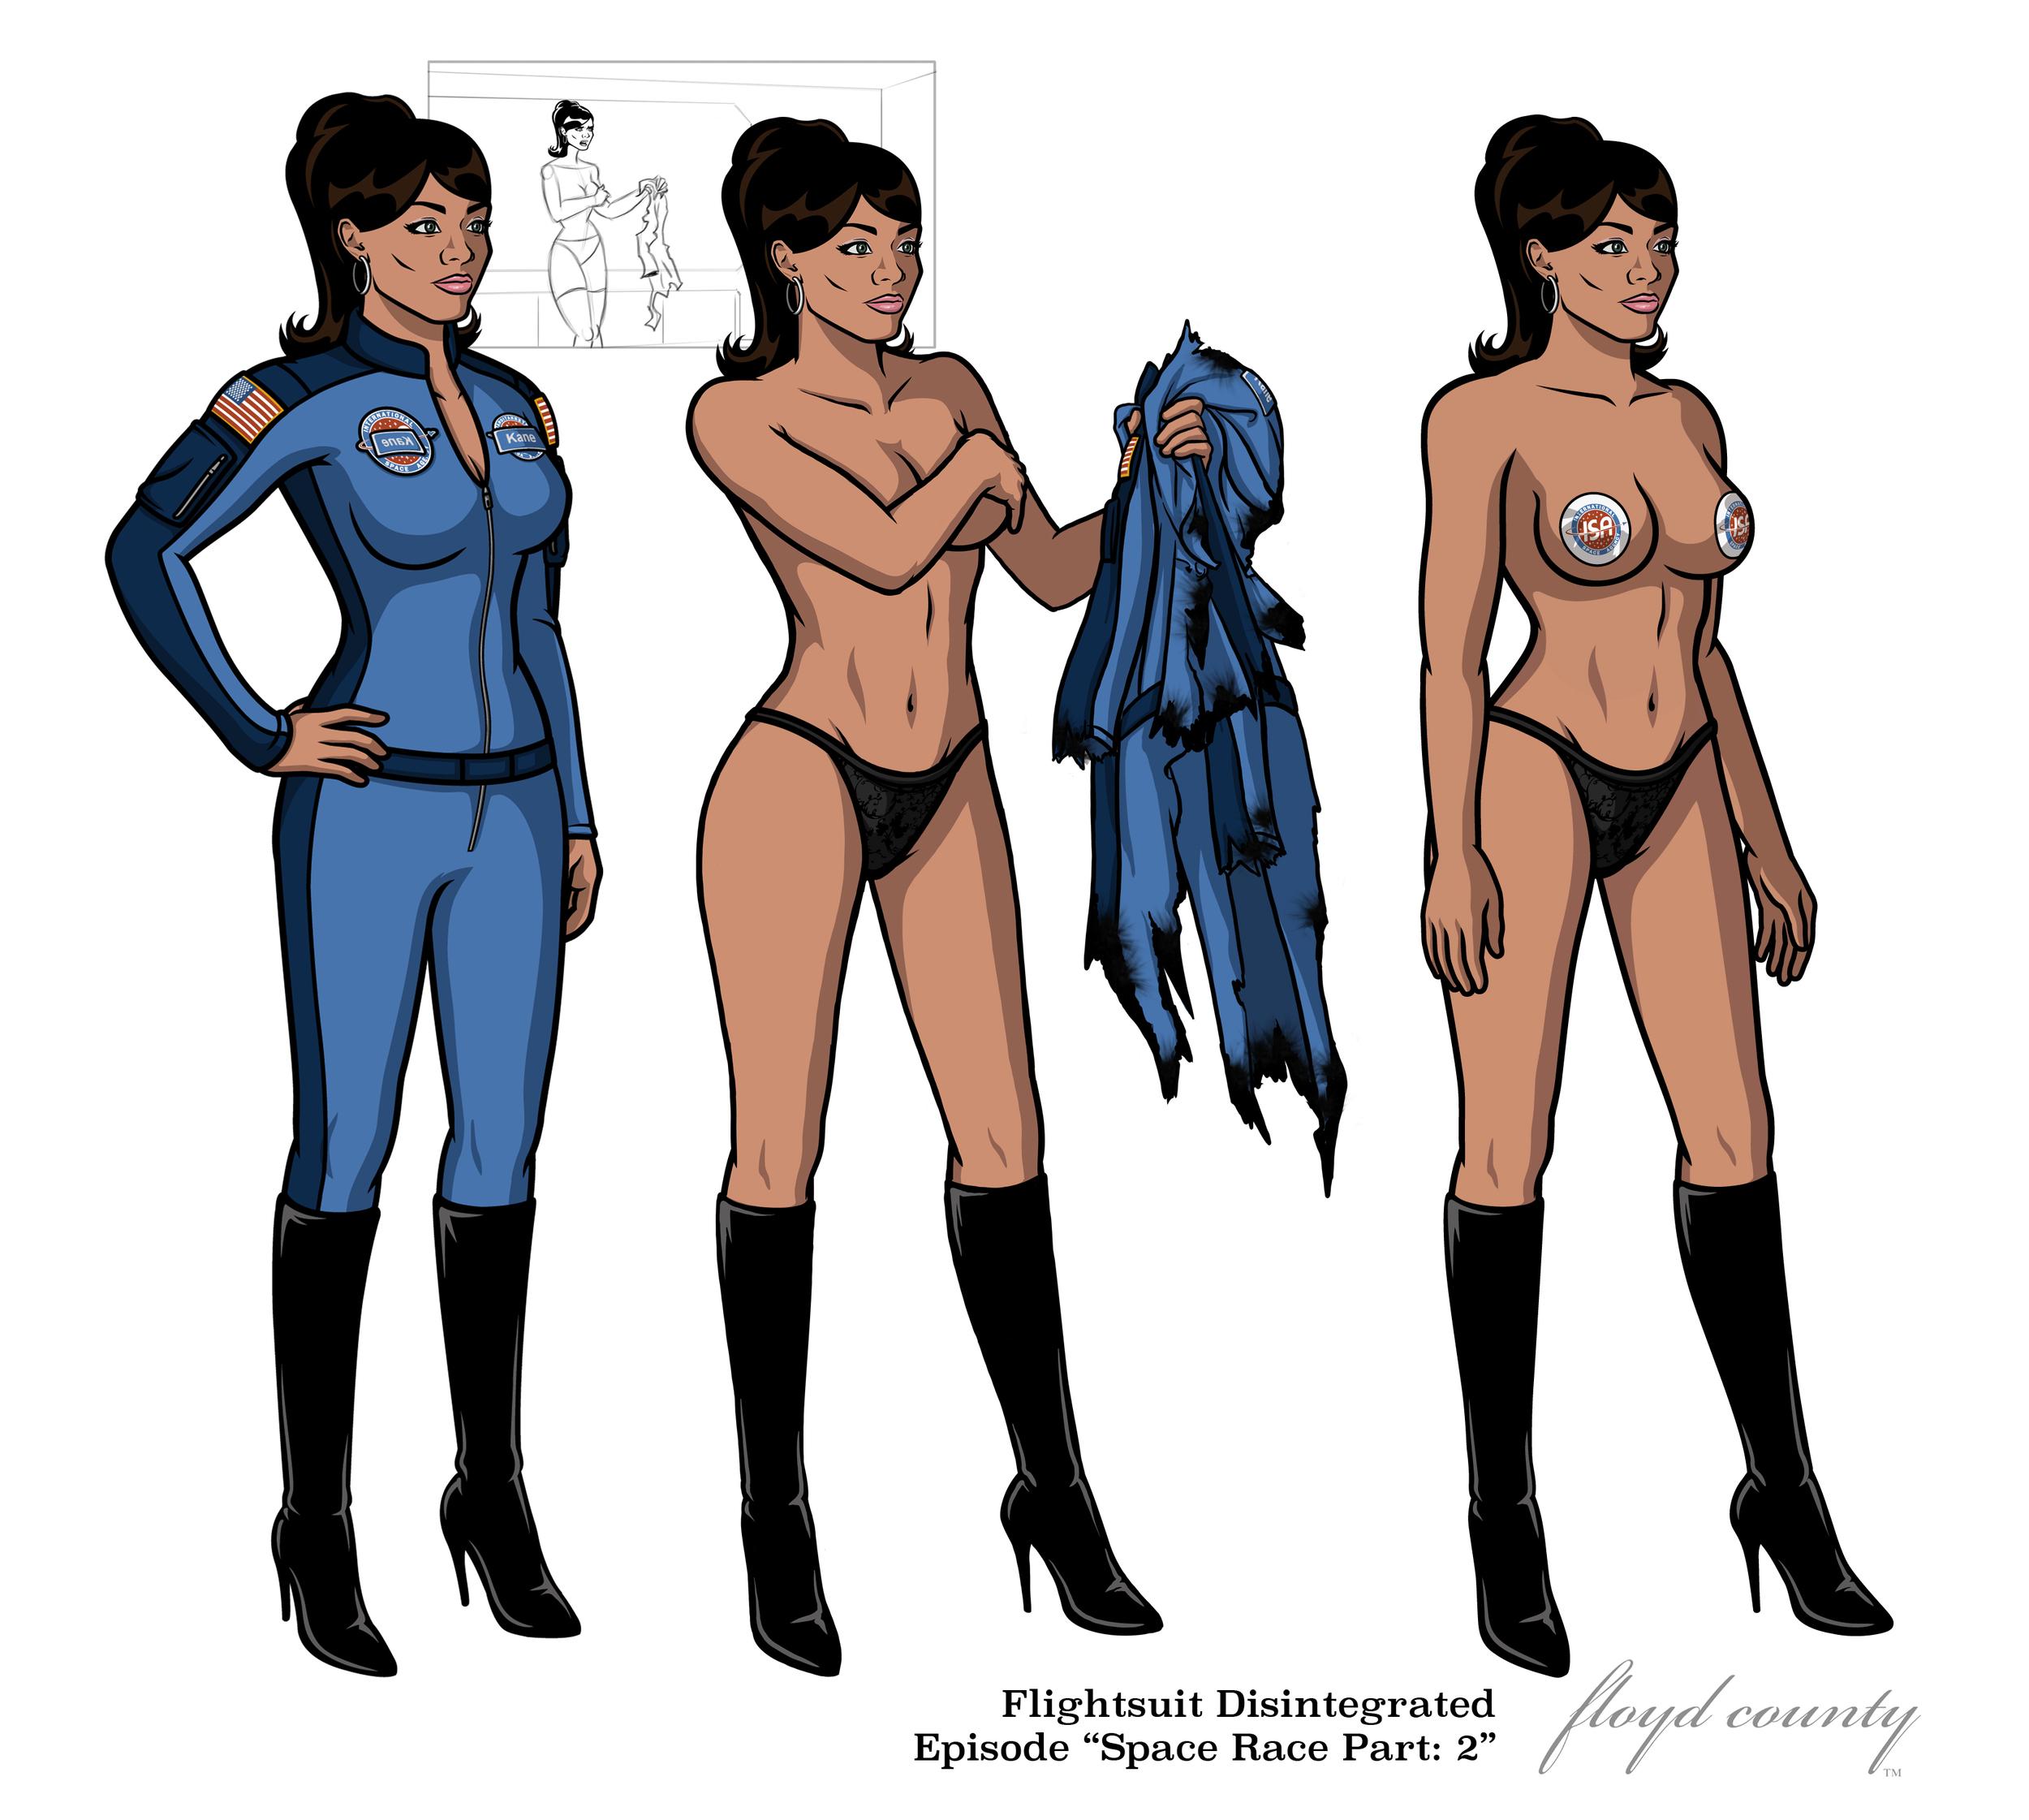 Lana_Flightsuit.jpg